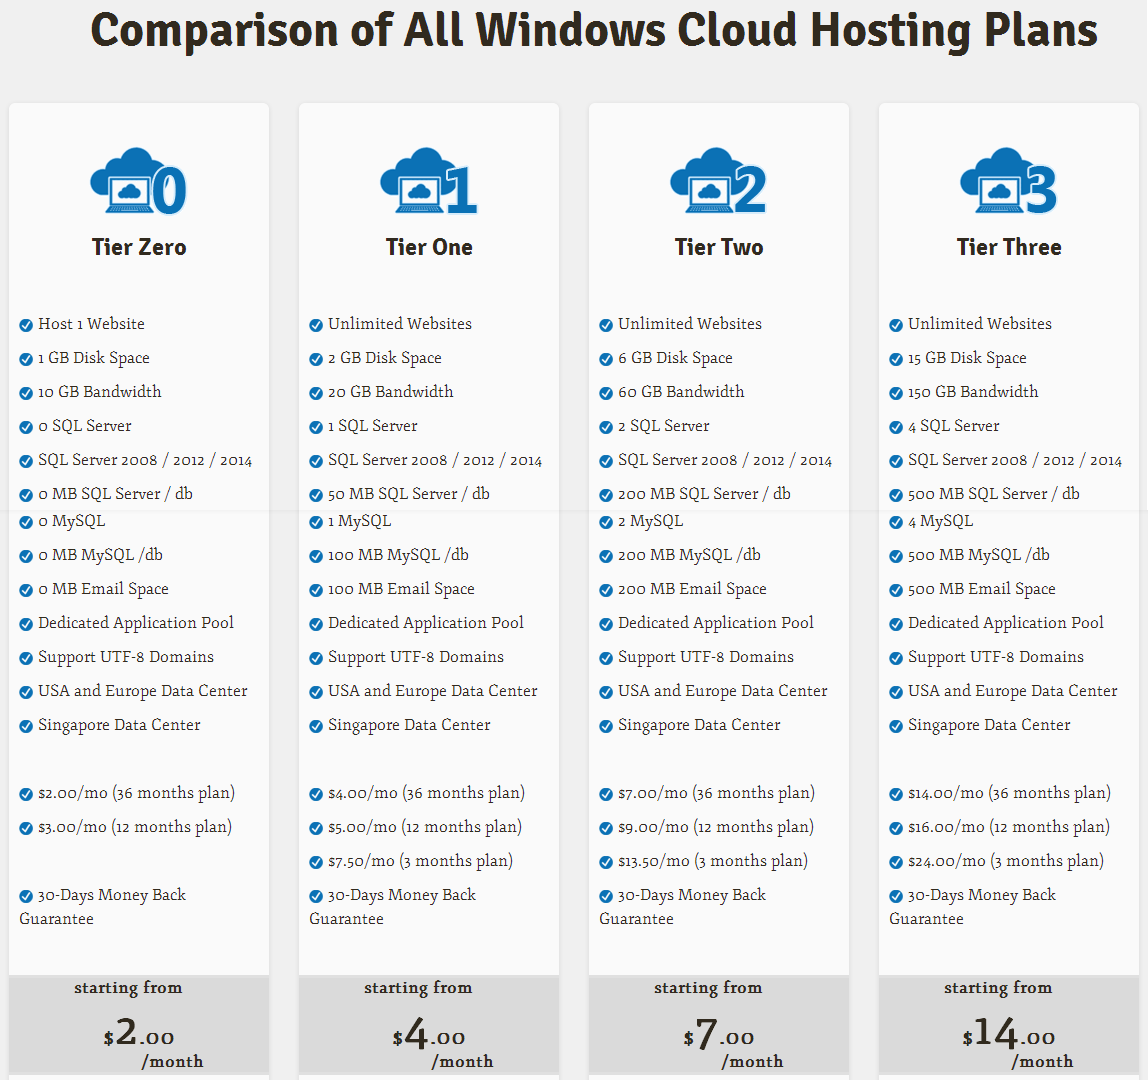 Windows Cloud Hosting